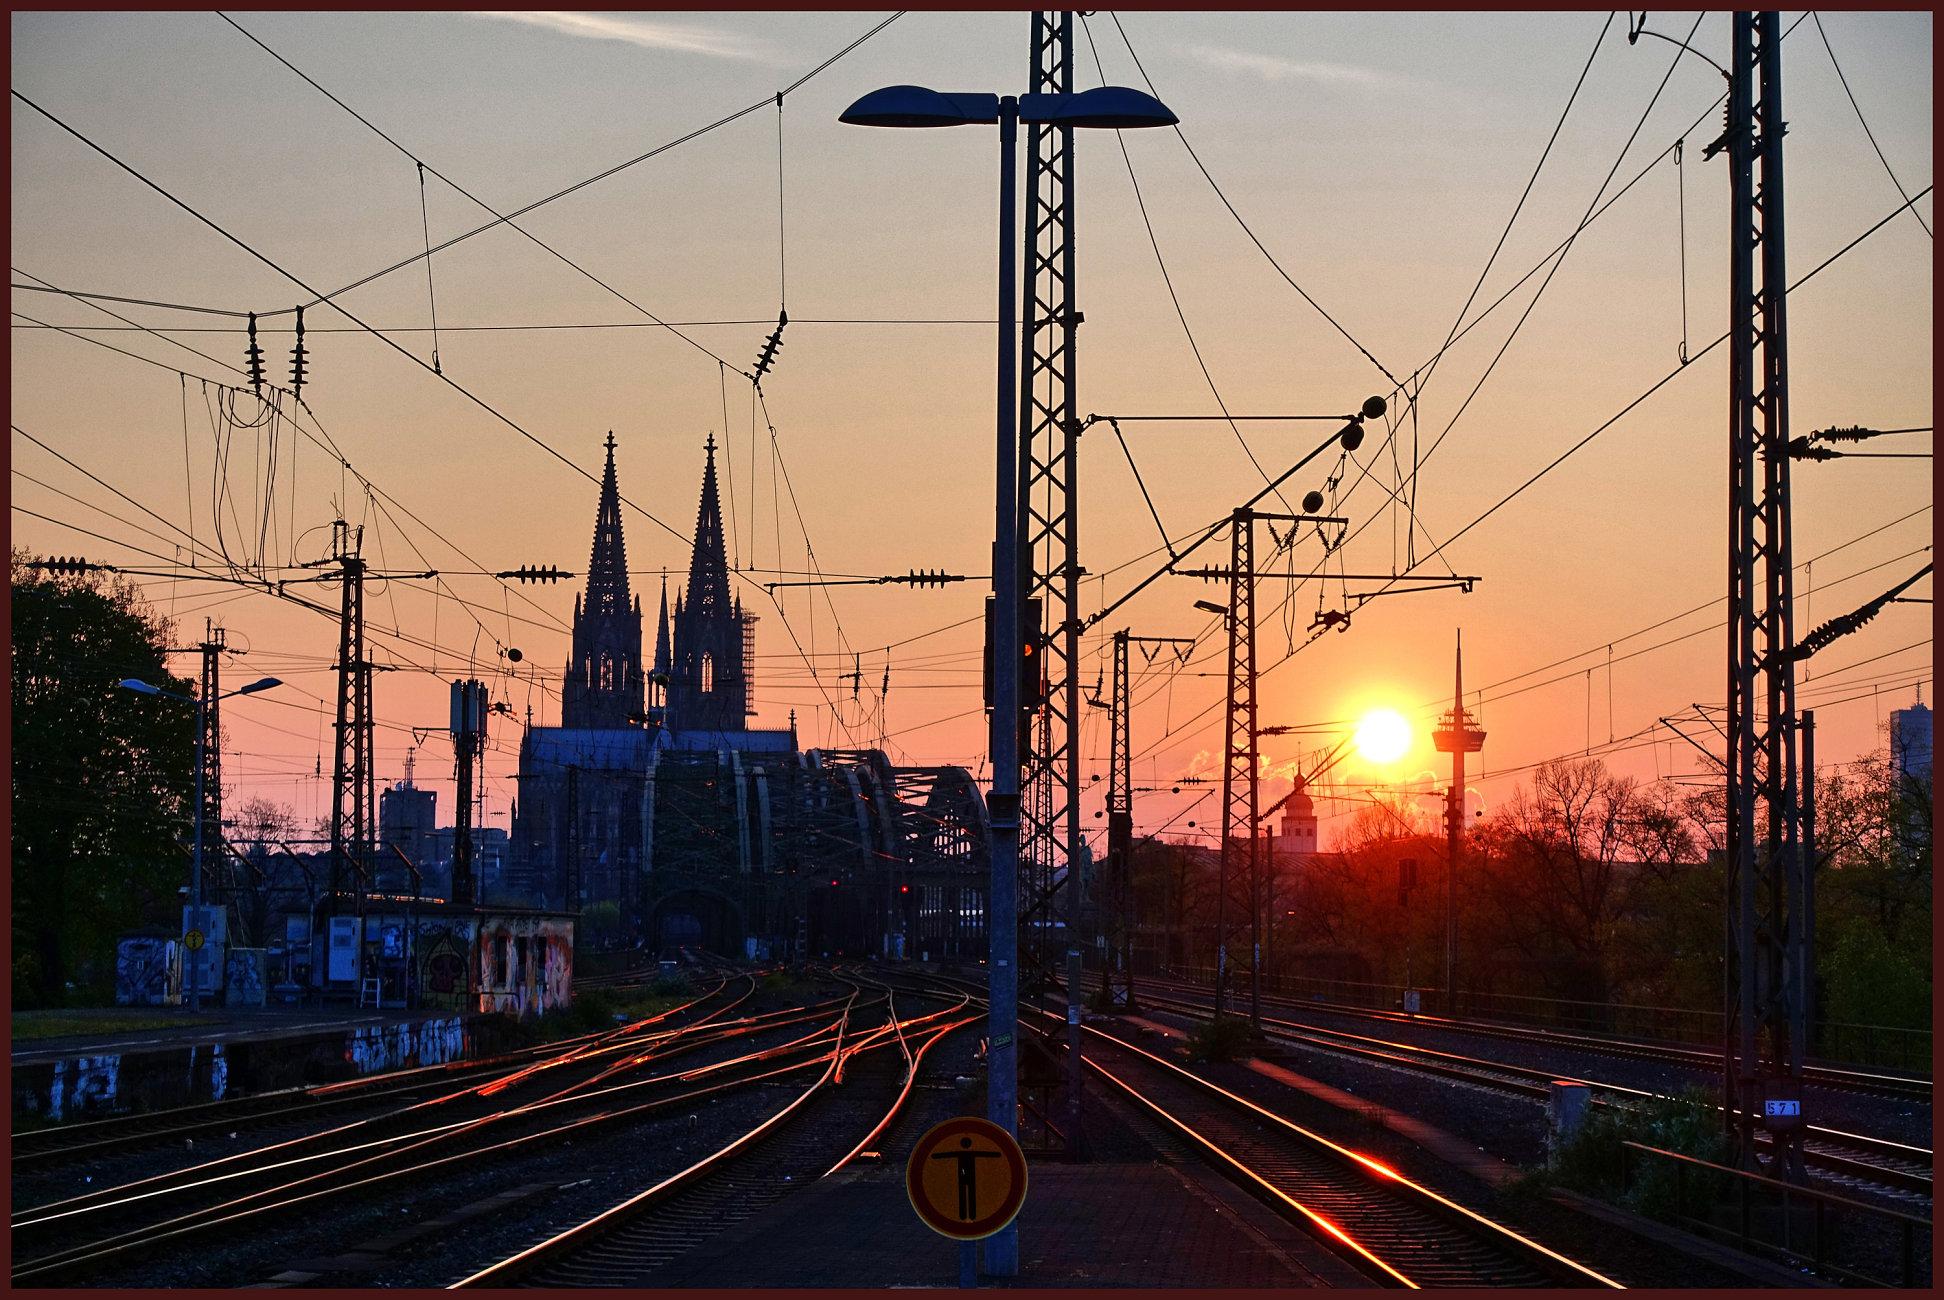 Near Cologne Station